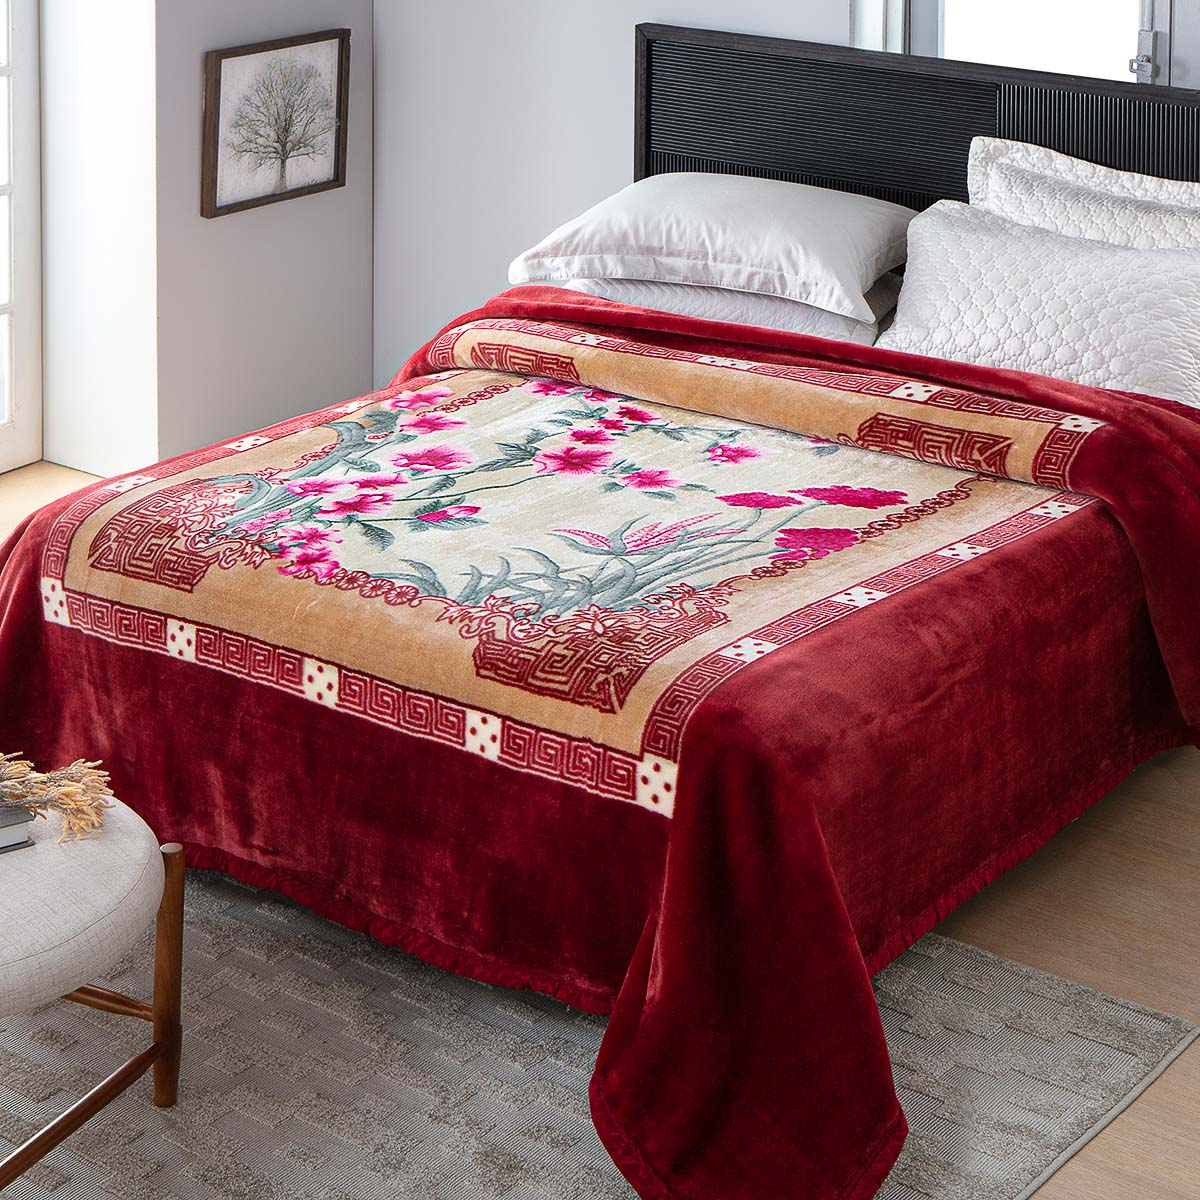 Cobertor Casal Antialérgico Raschel Jolitex 1,80x2,20m Adriatico Vinho